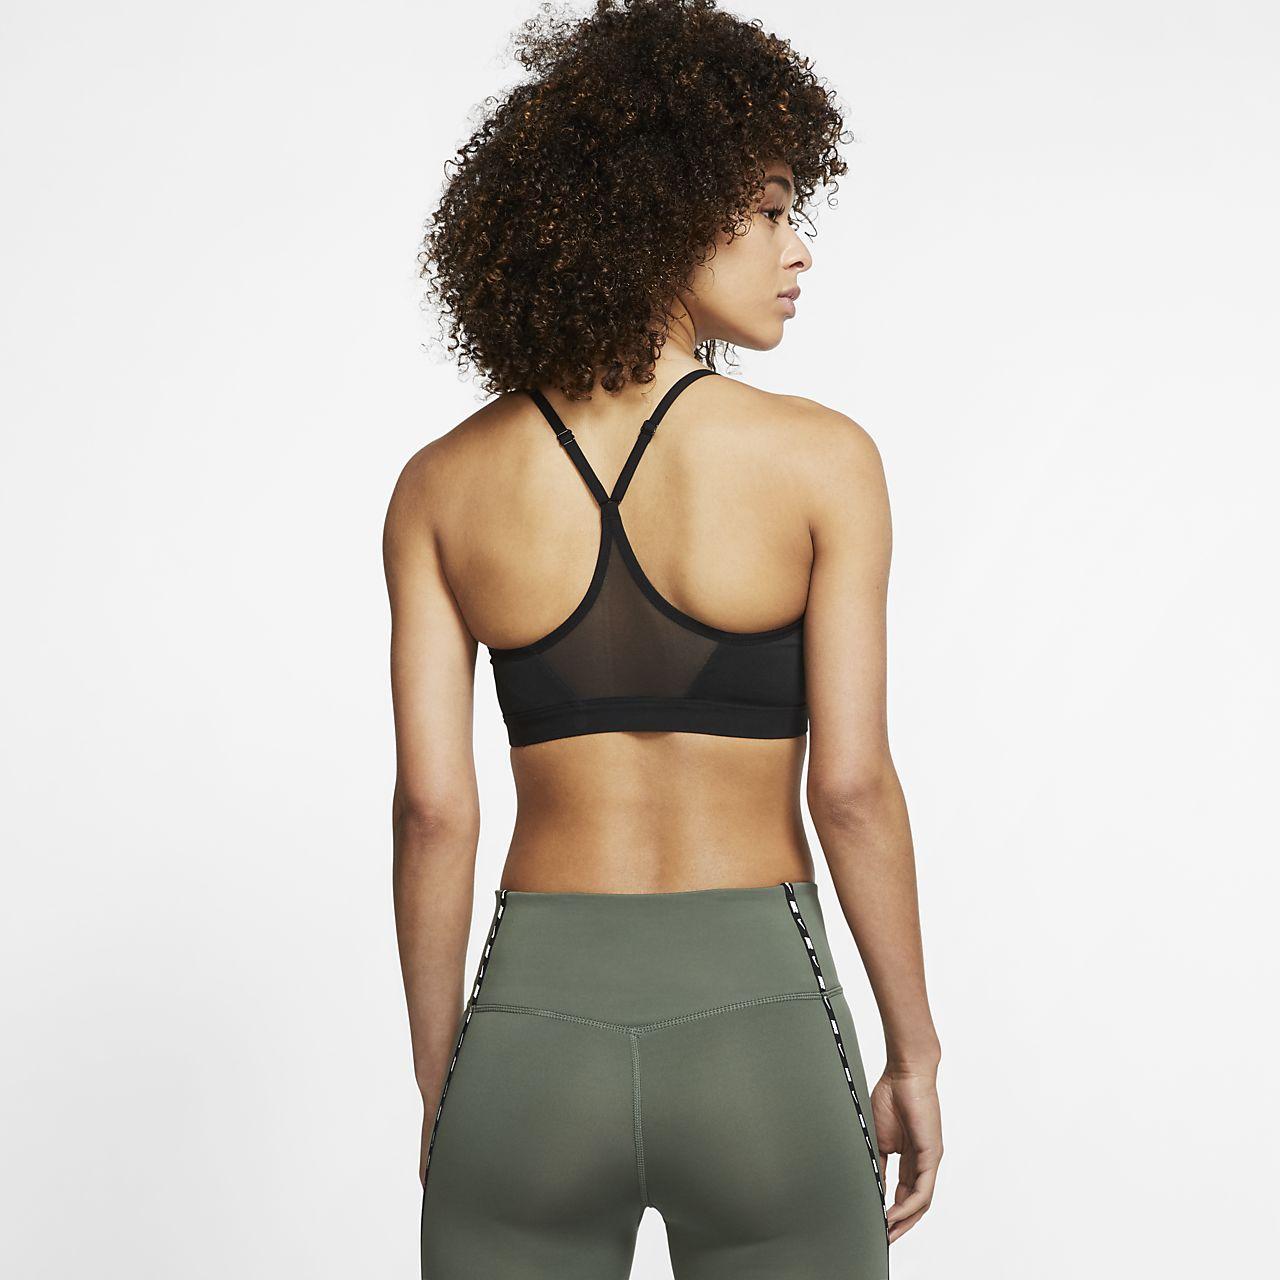 6975acb7cb553 Nike Indy Women s Light-Support Sports Bra. Nike.com